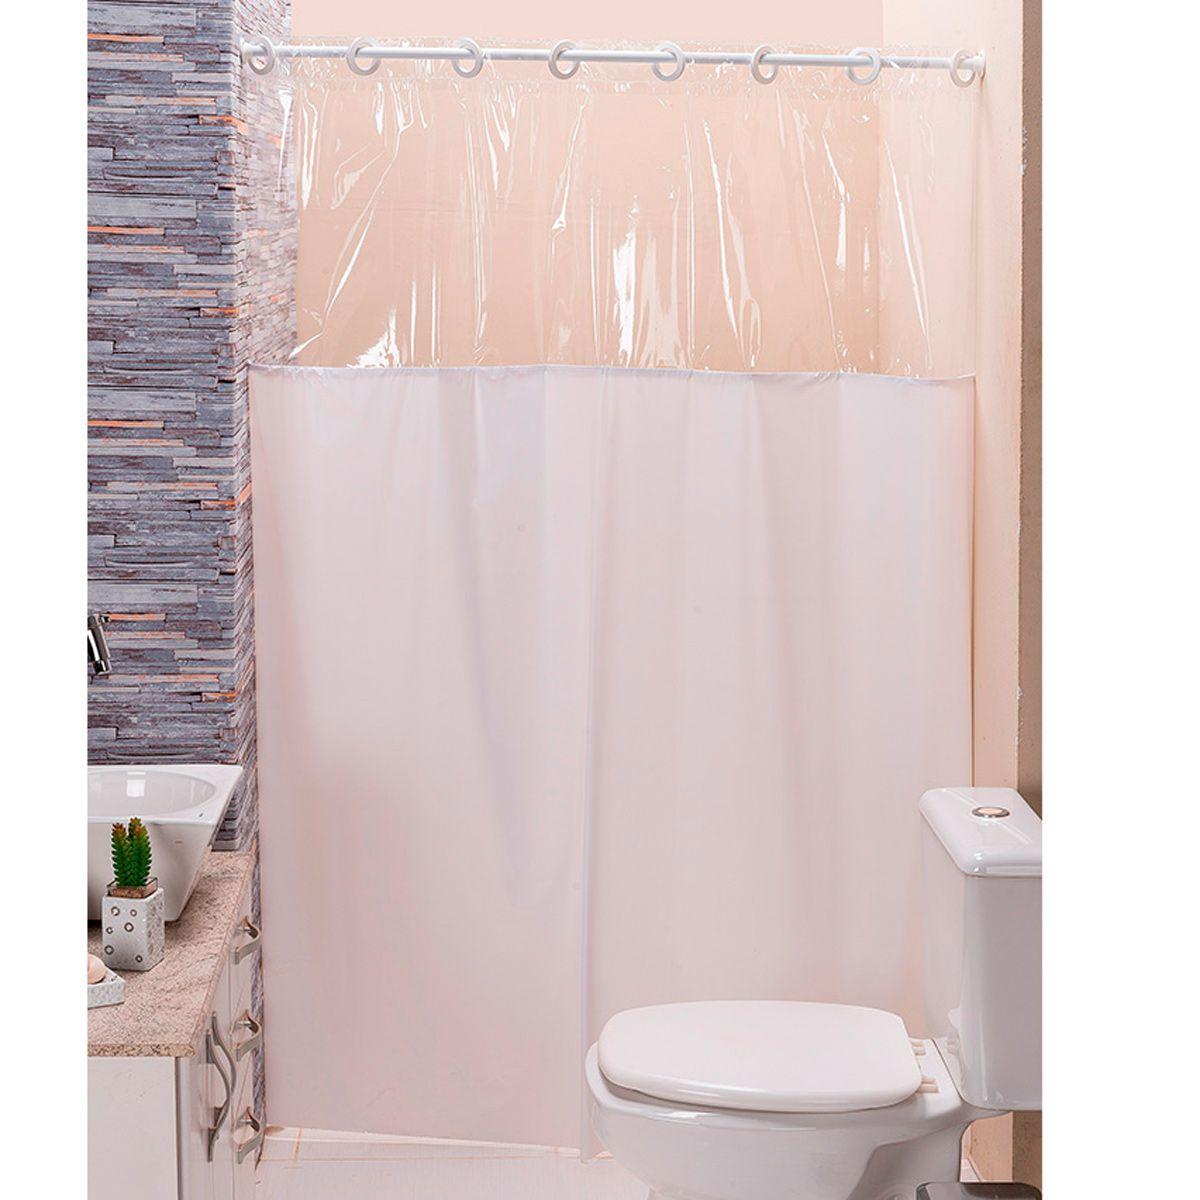 Cortina p/ Box de Banheiro Branco 1,40m X 1,98m